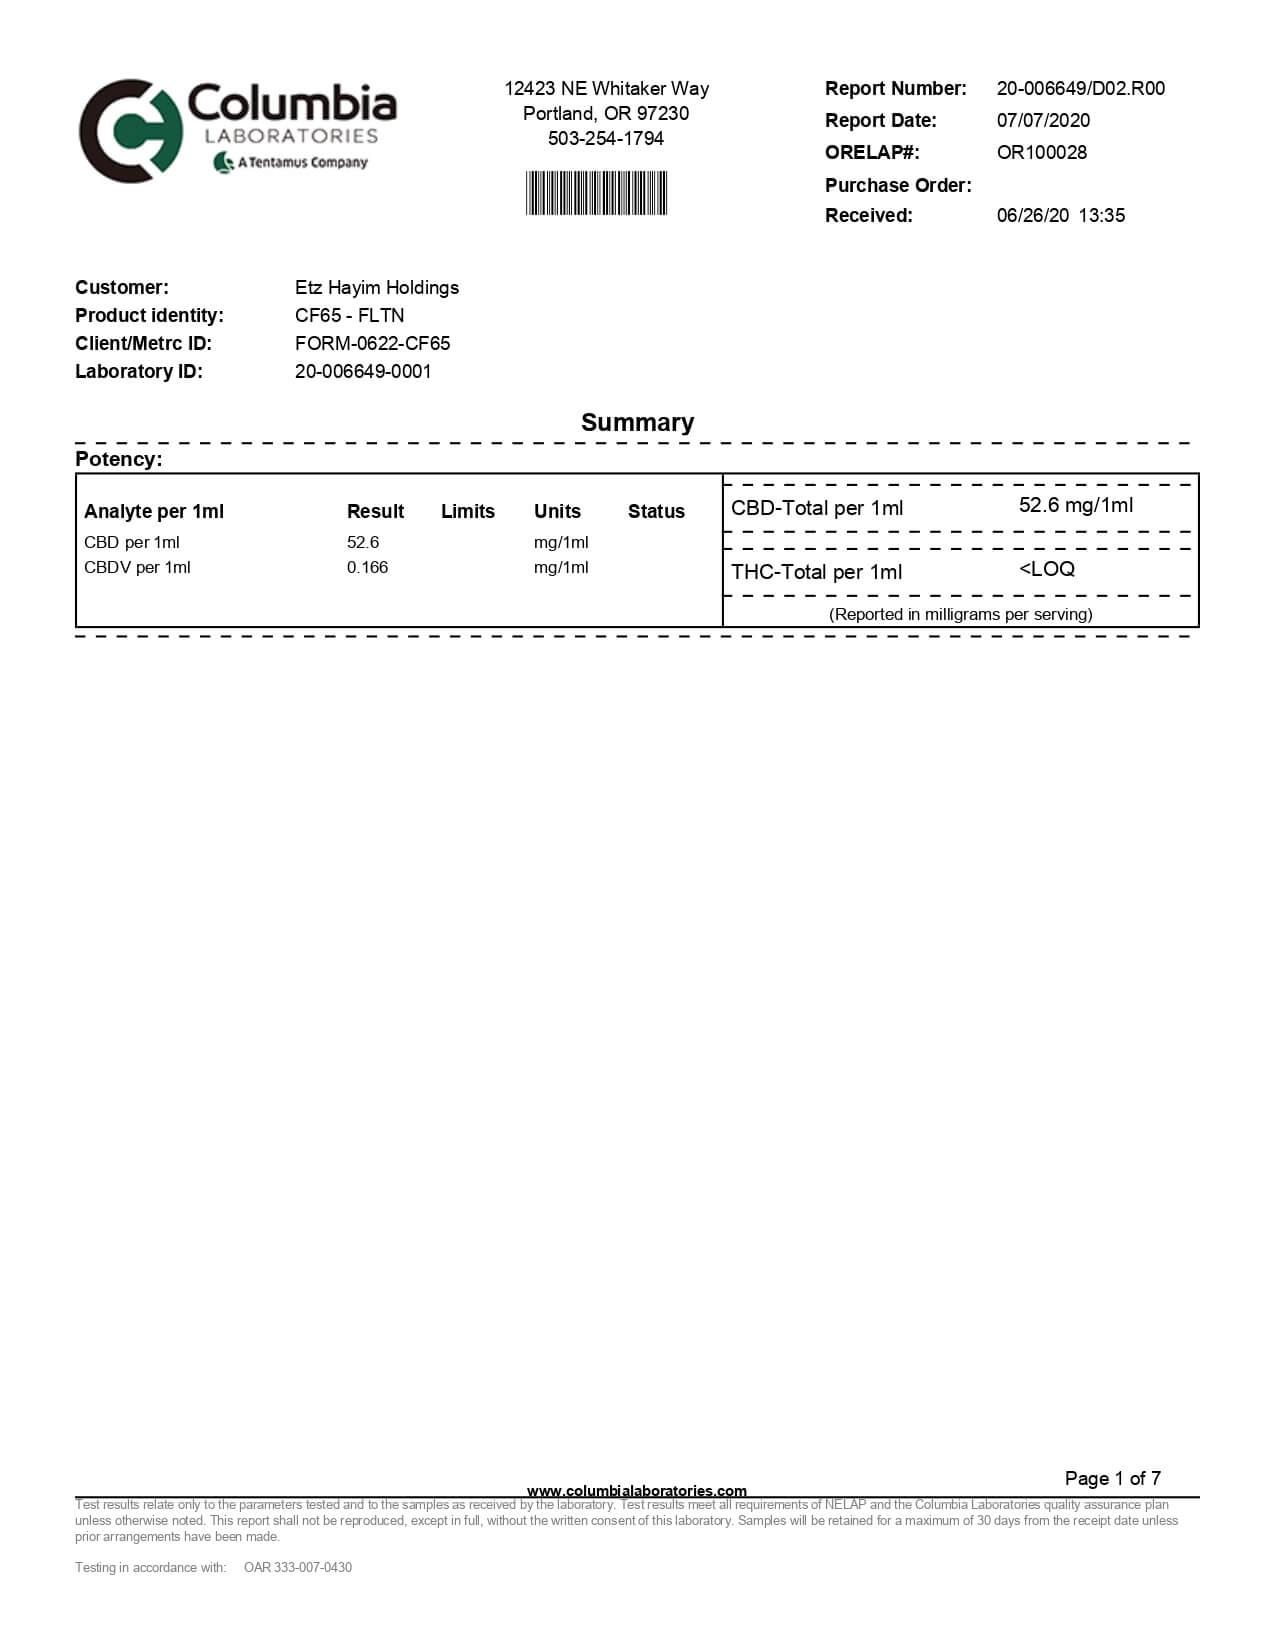 Lazarus Naturals High Potency CBD Tincture Flavorless Lab Report